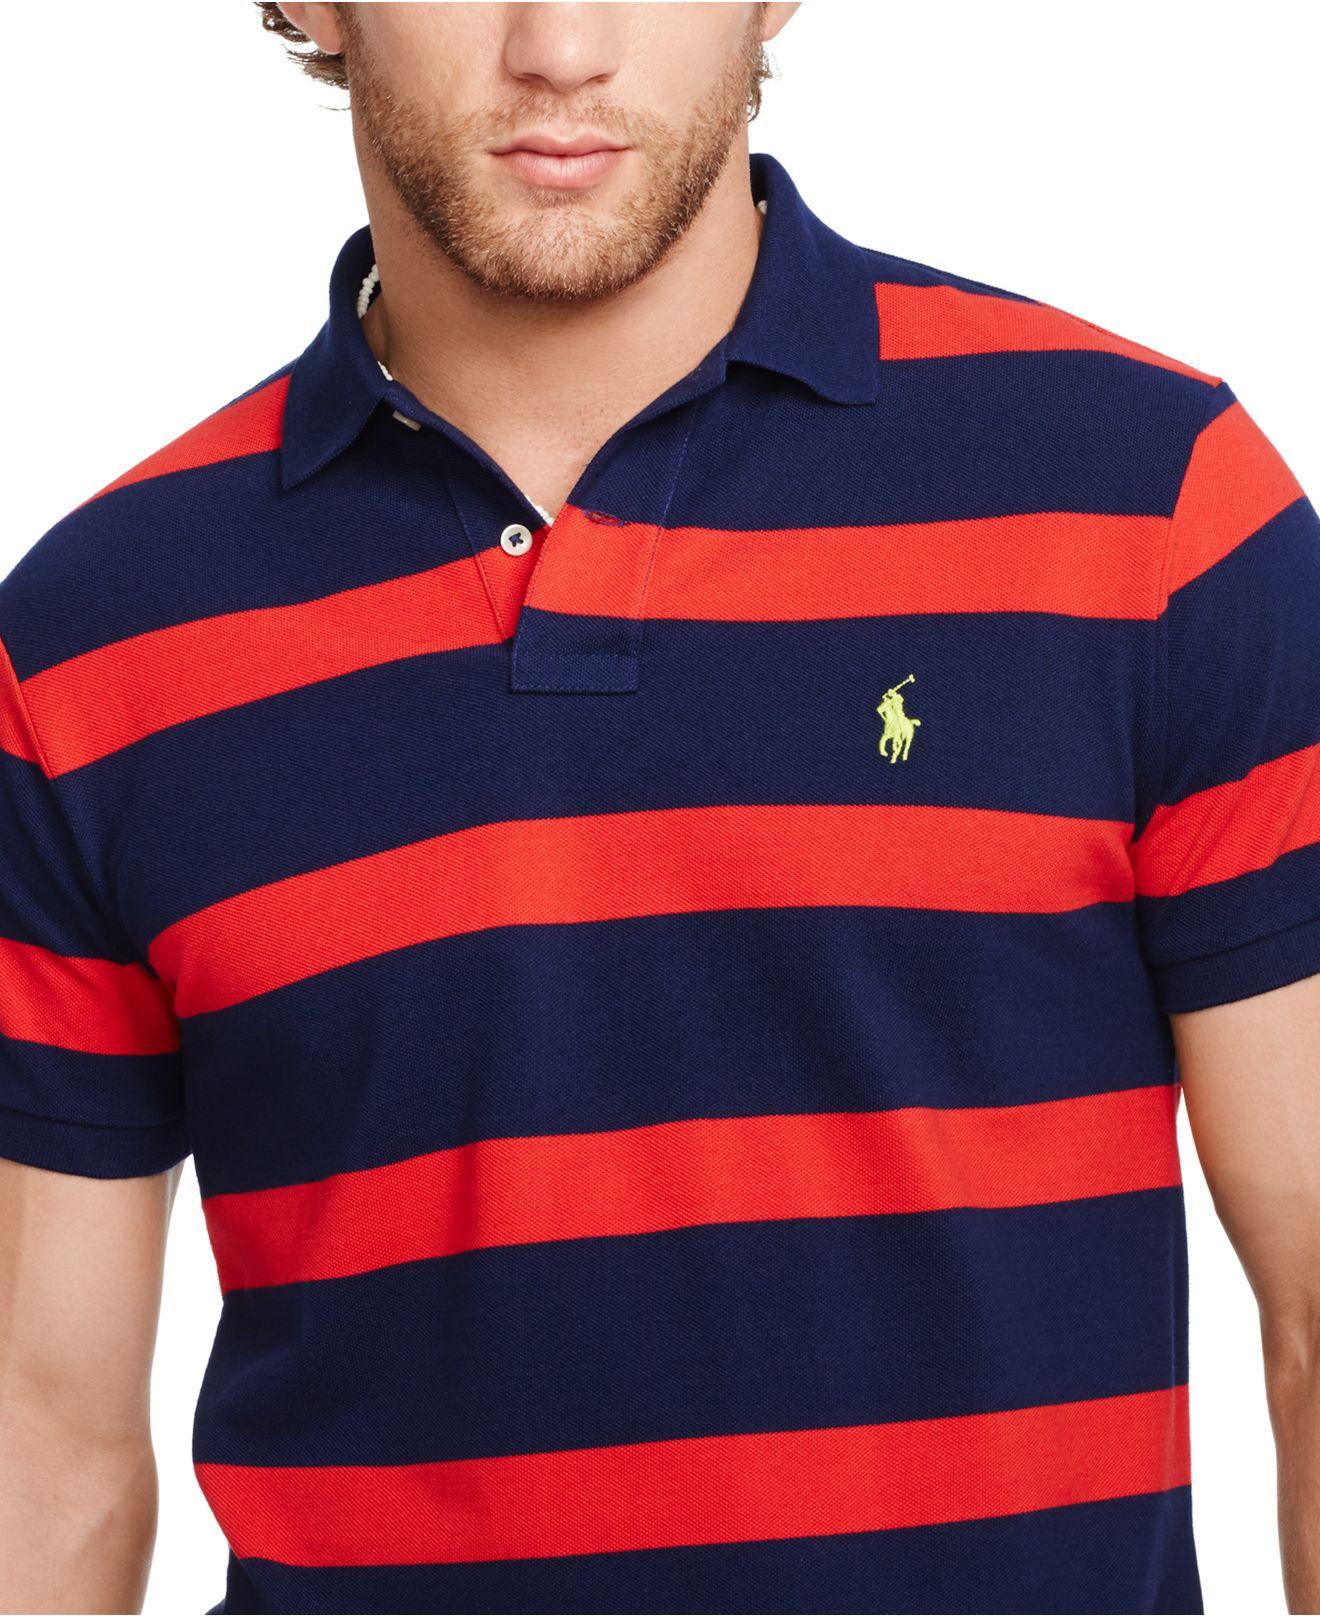 93dd9818f Polo Ralph Lauren Custom-fit Striped Mesh Polo in Blue for Men - Lyst